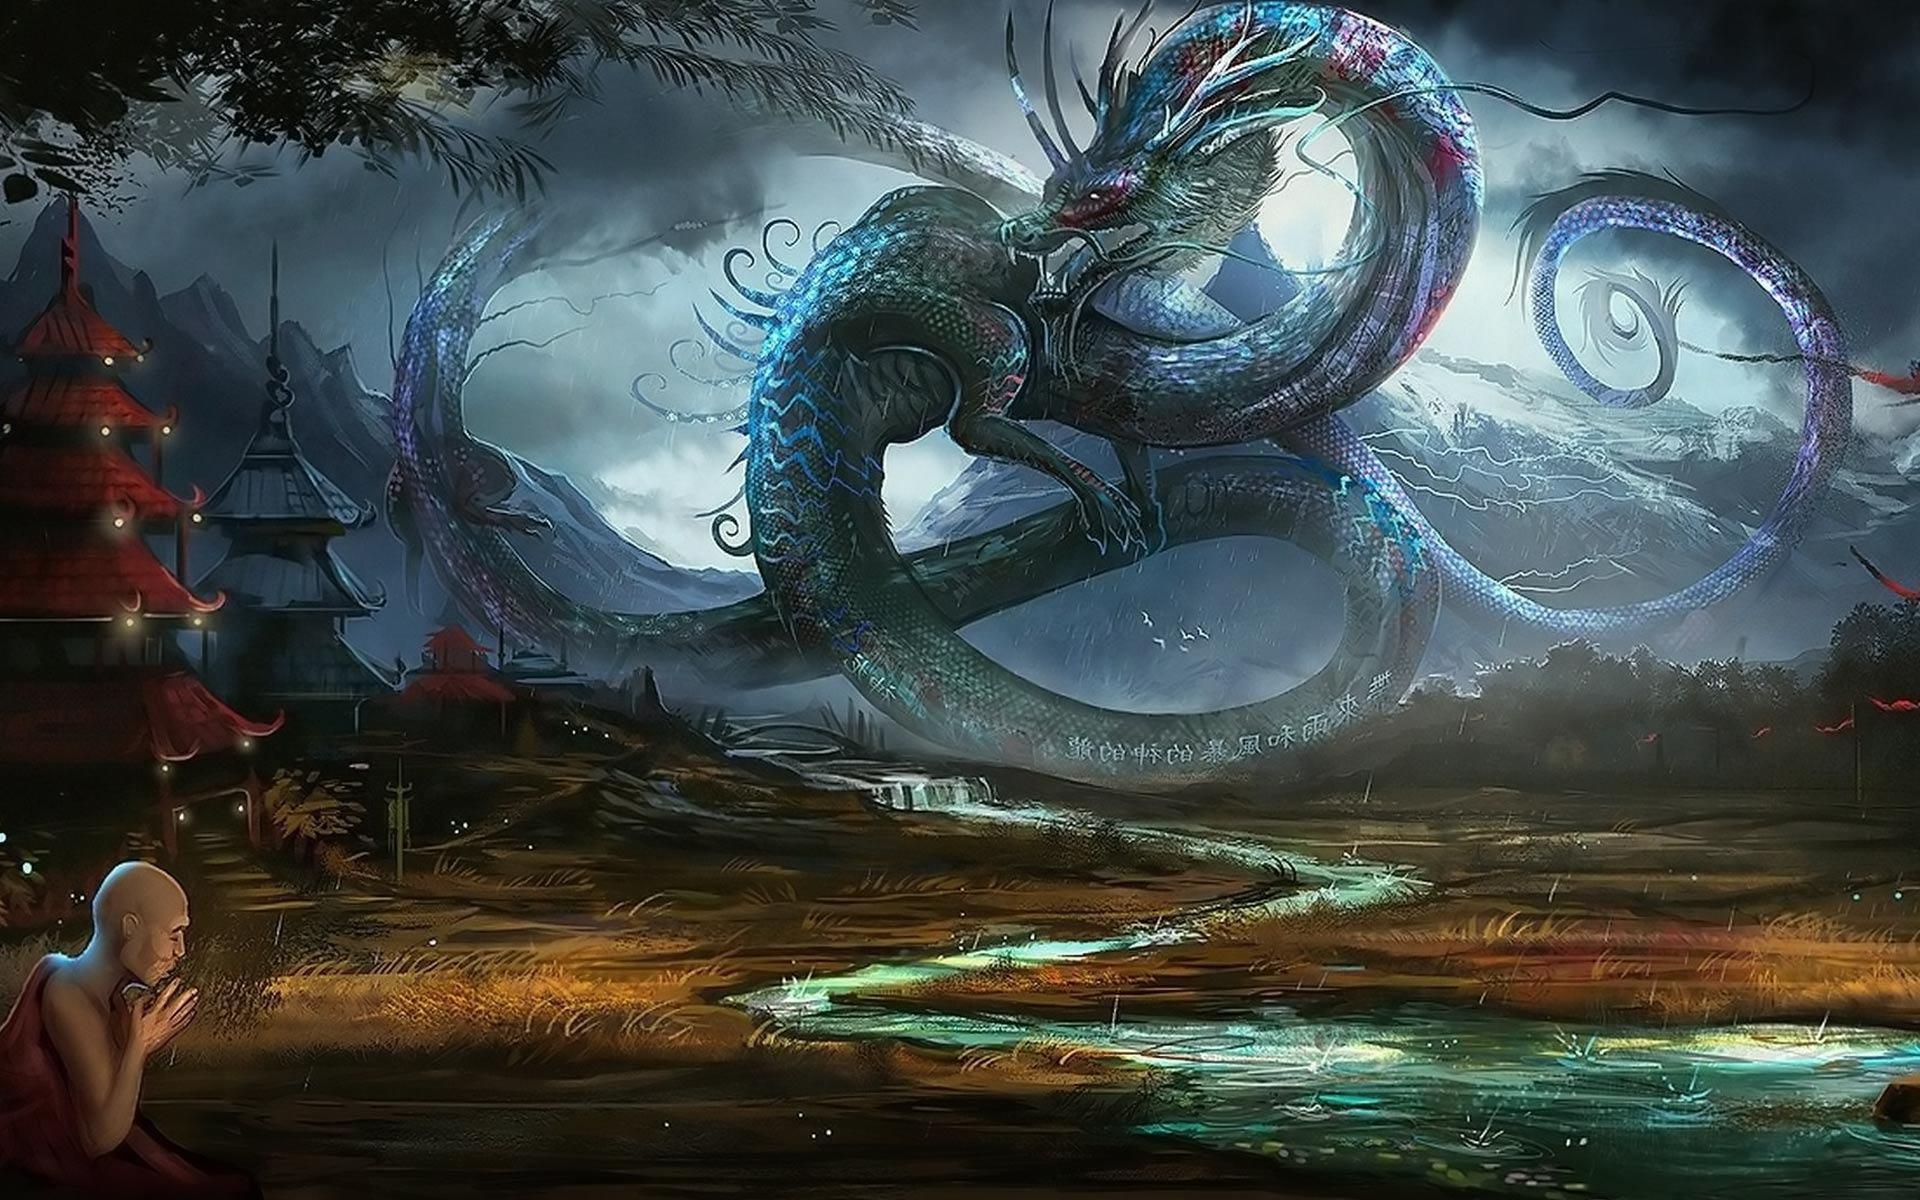 Dragon in ancient China wallpaper 844 1920x1200